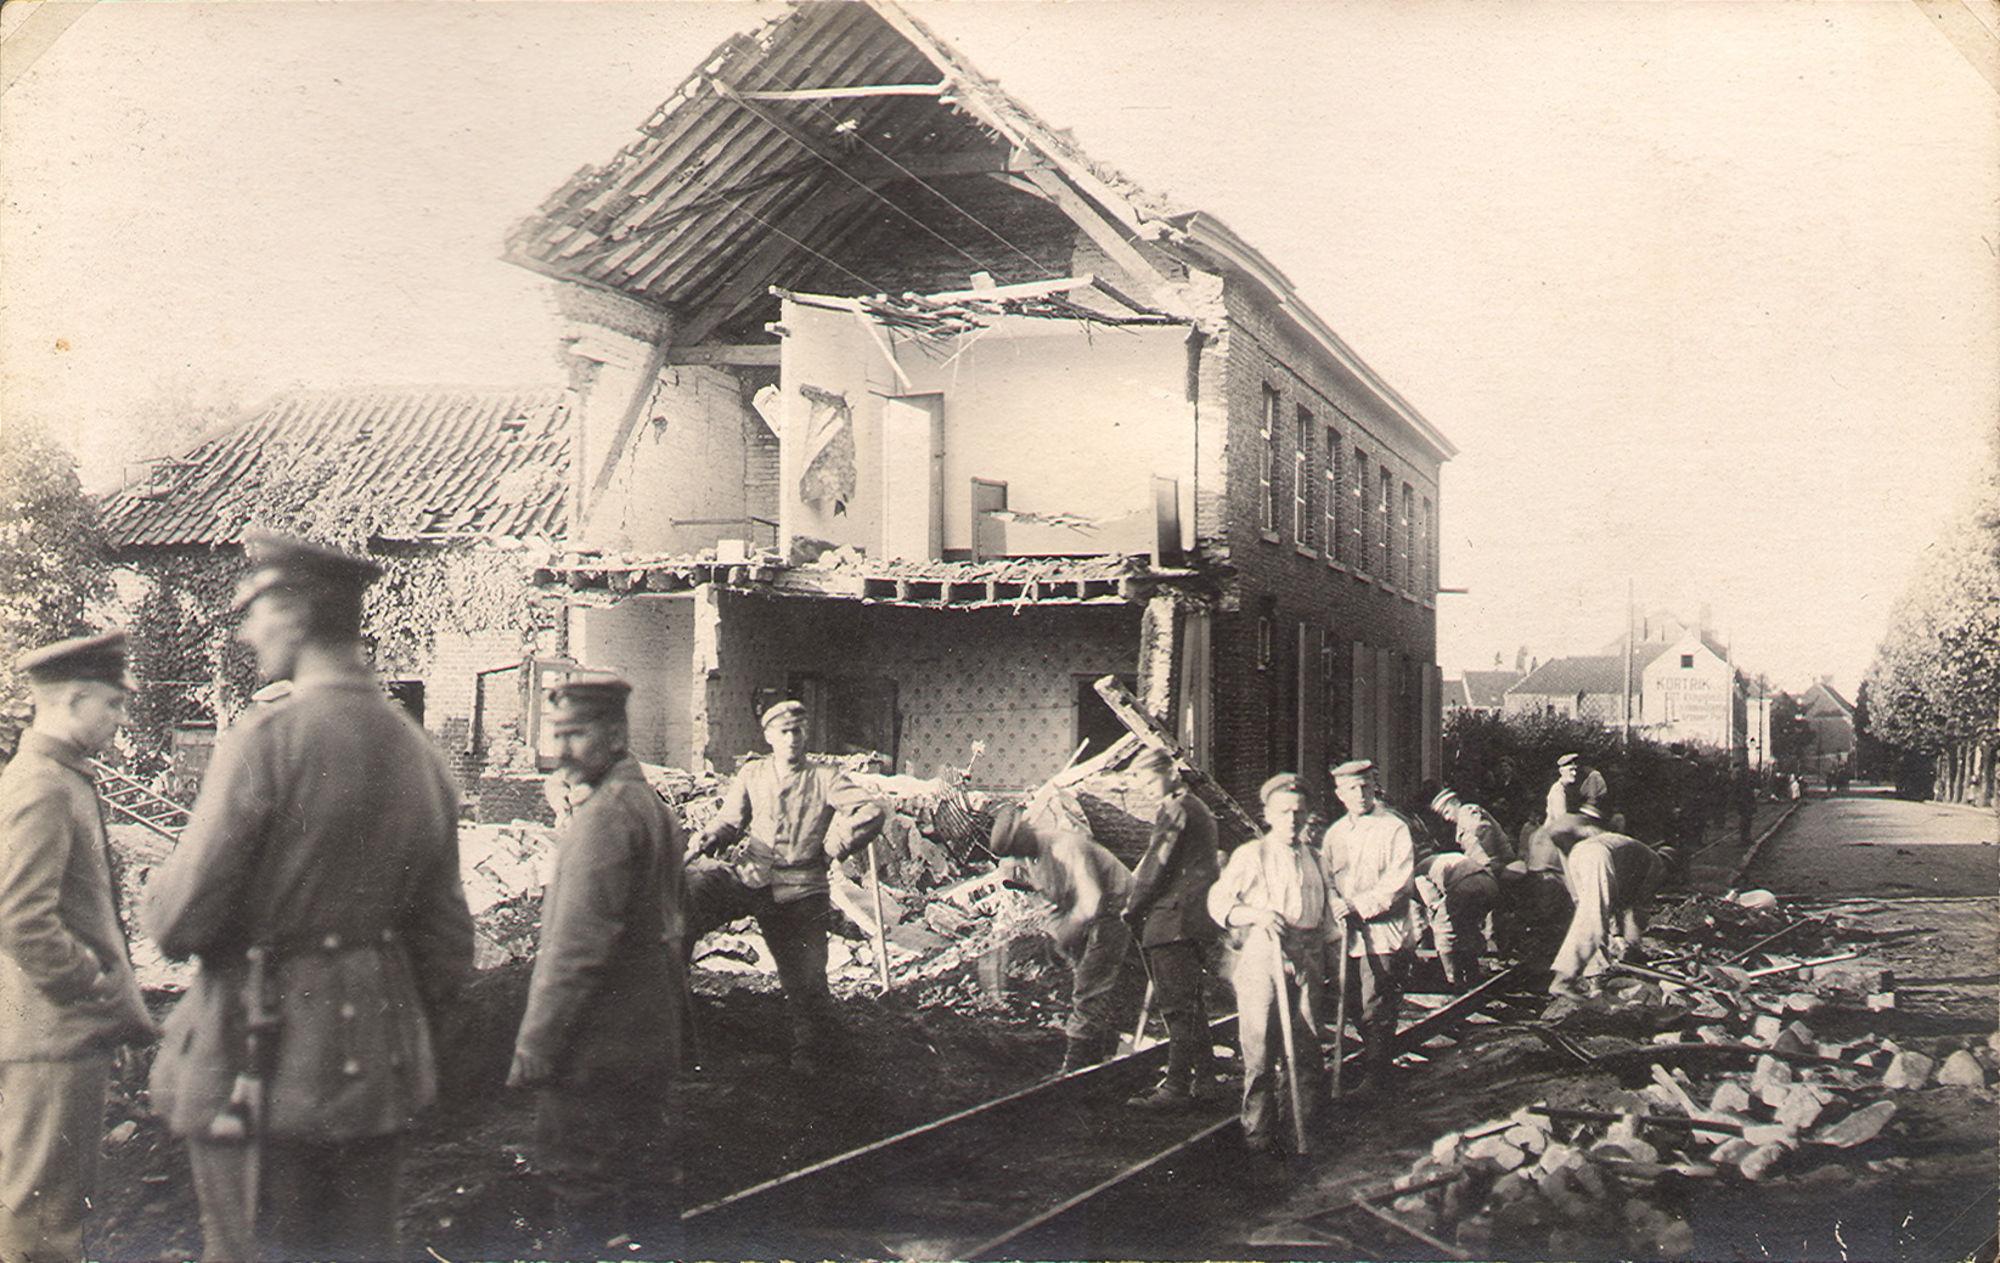 Café 'de tien minuten' in 1918